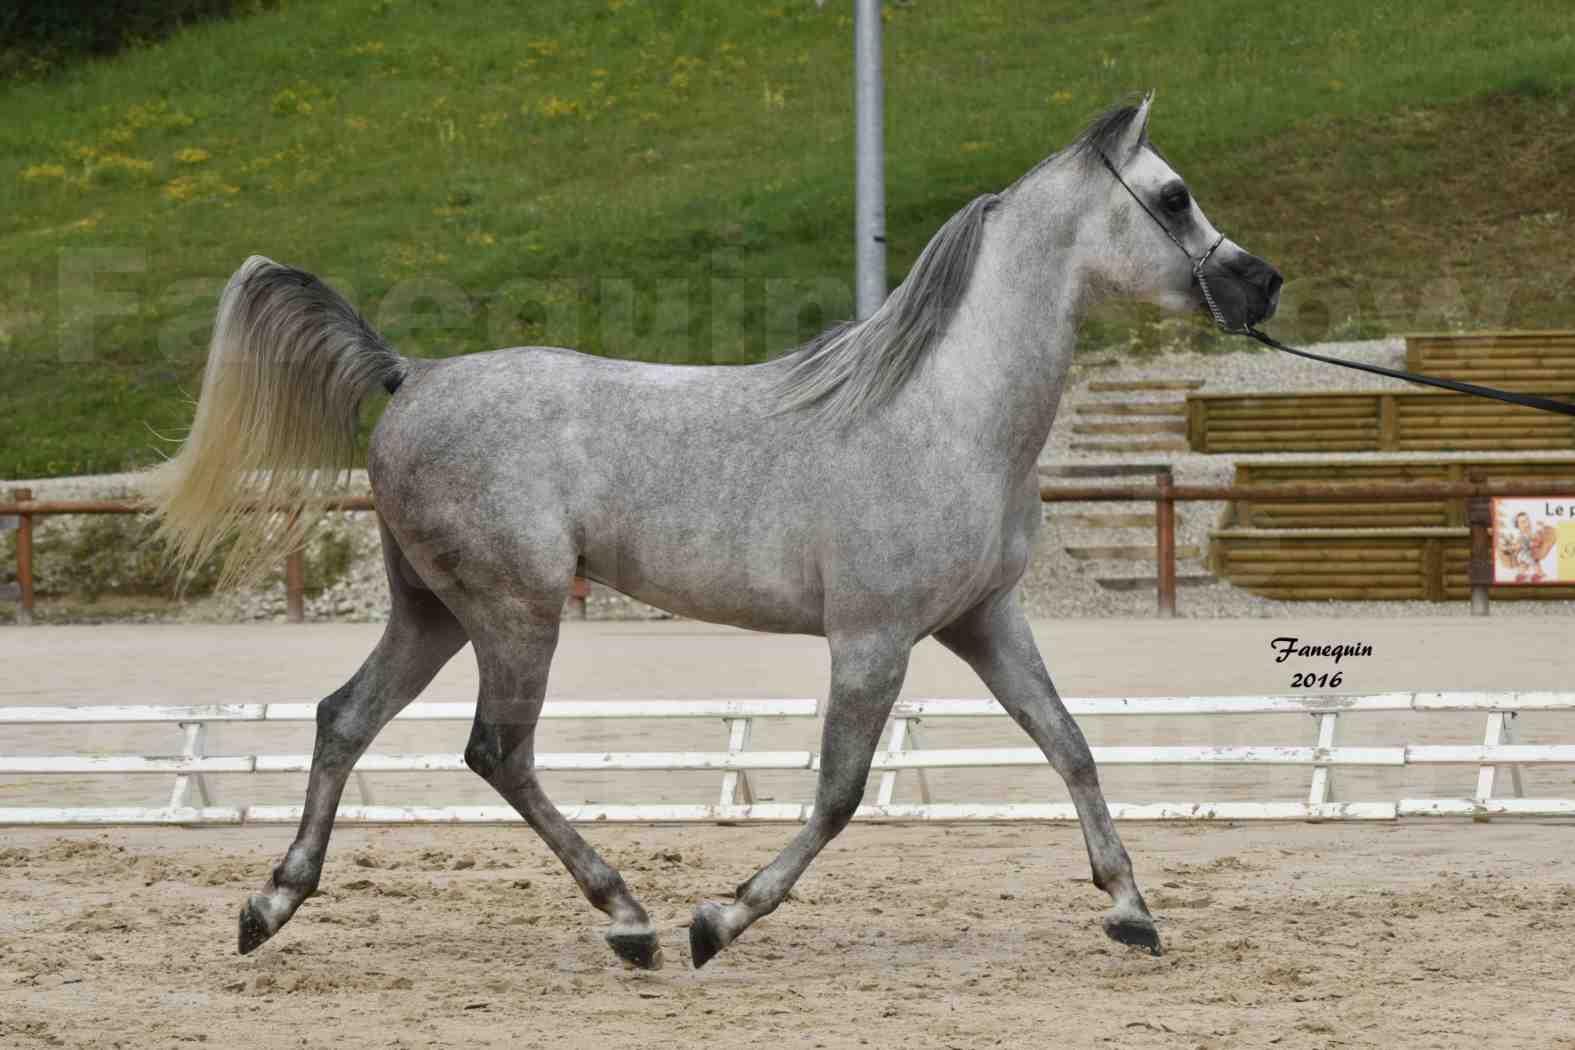 Show national de chevaux arabe à CHAZEY sur AIN - ANWAR ISHANE - 3